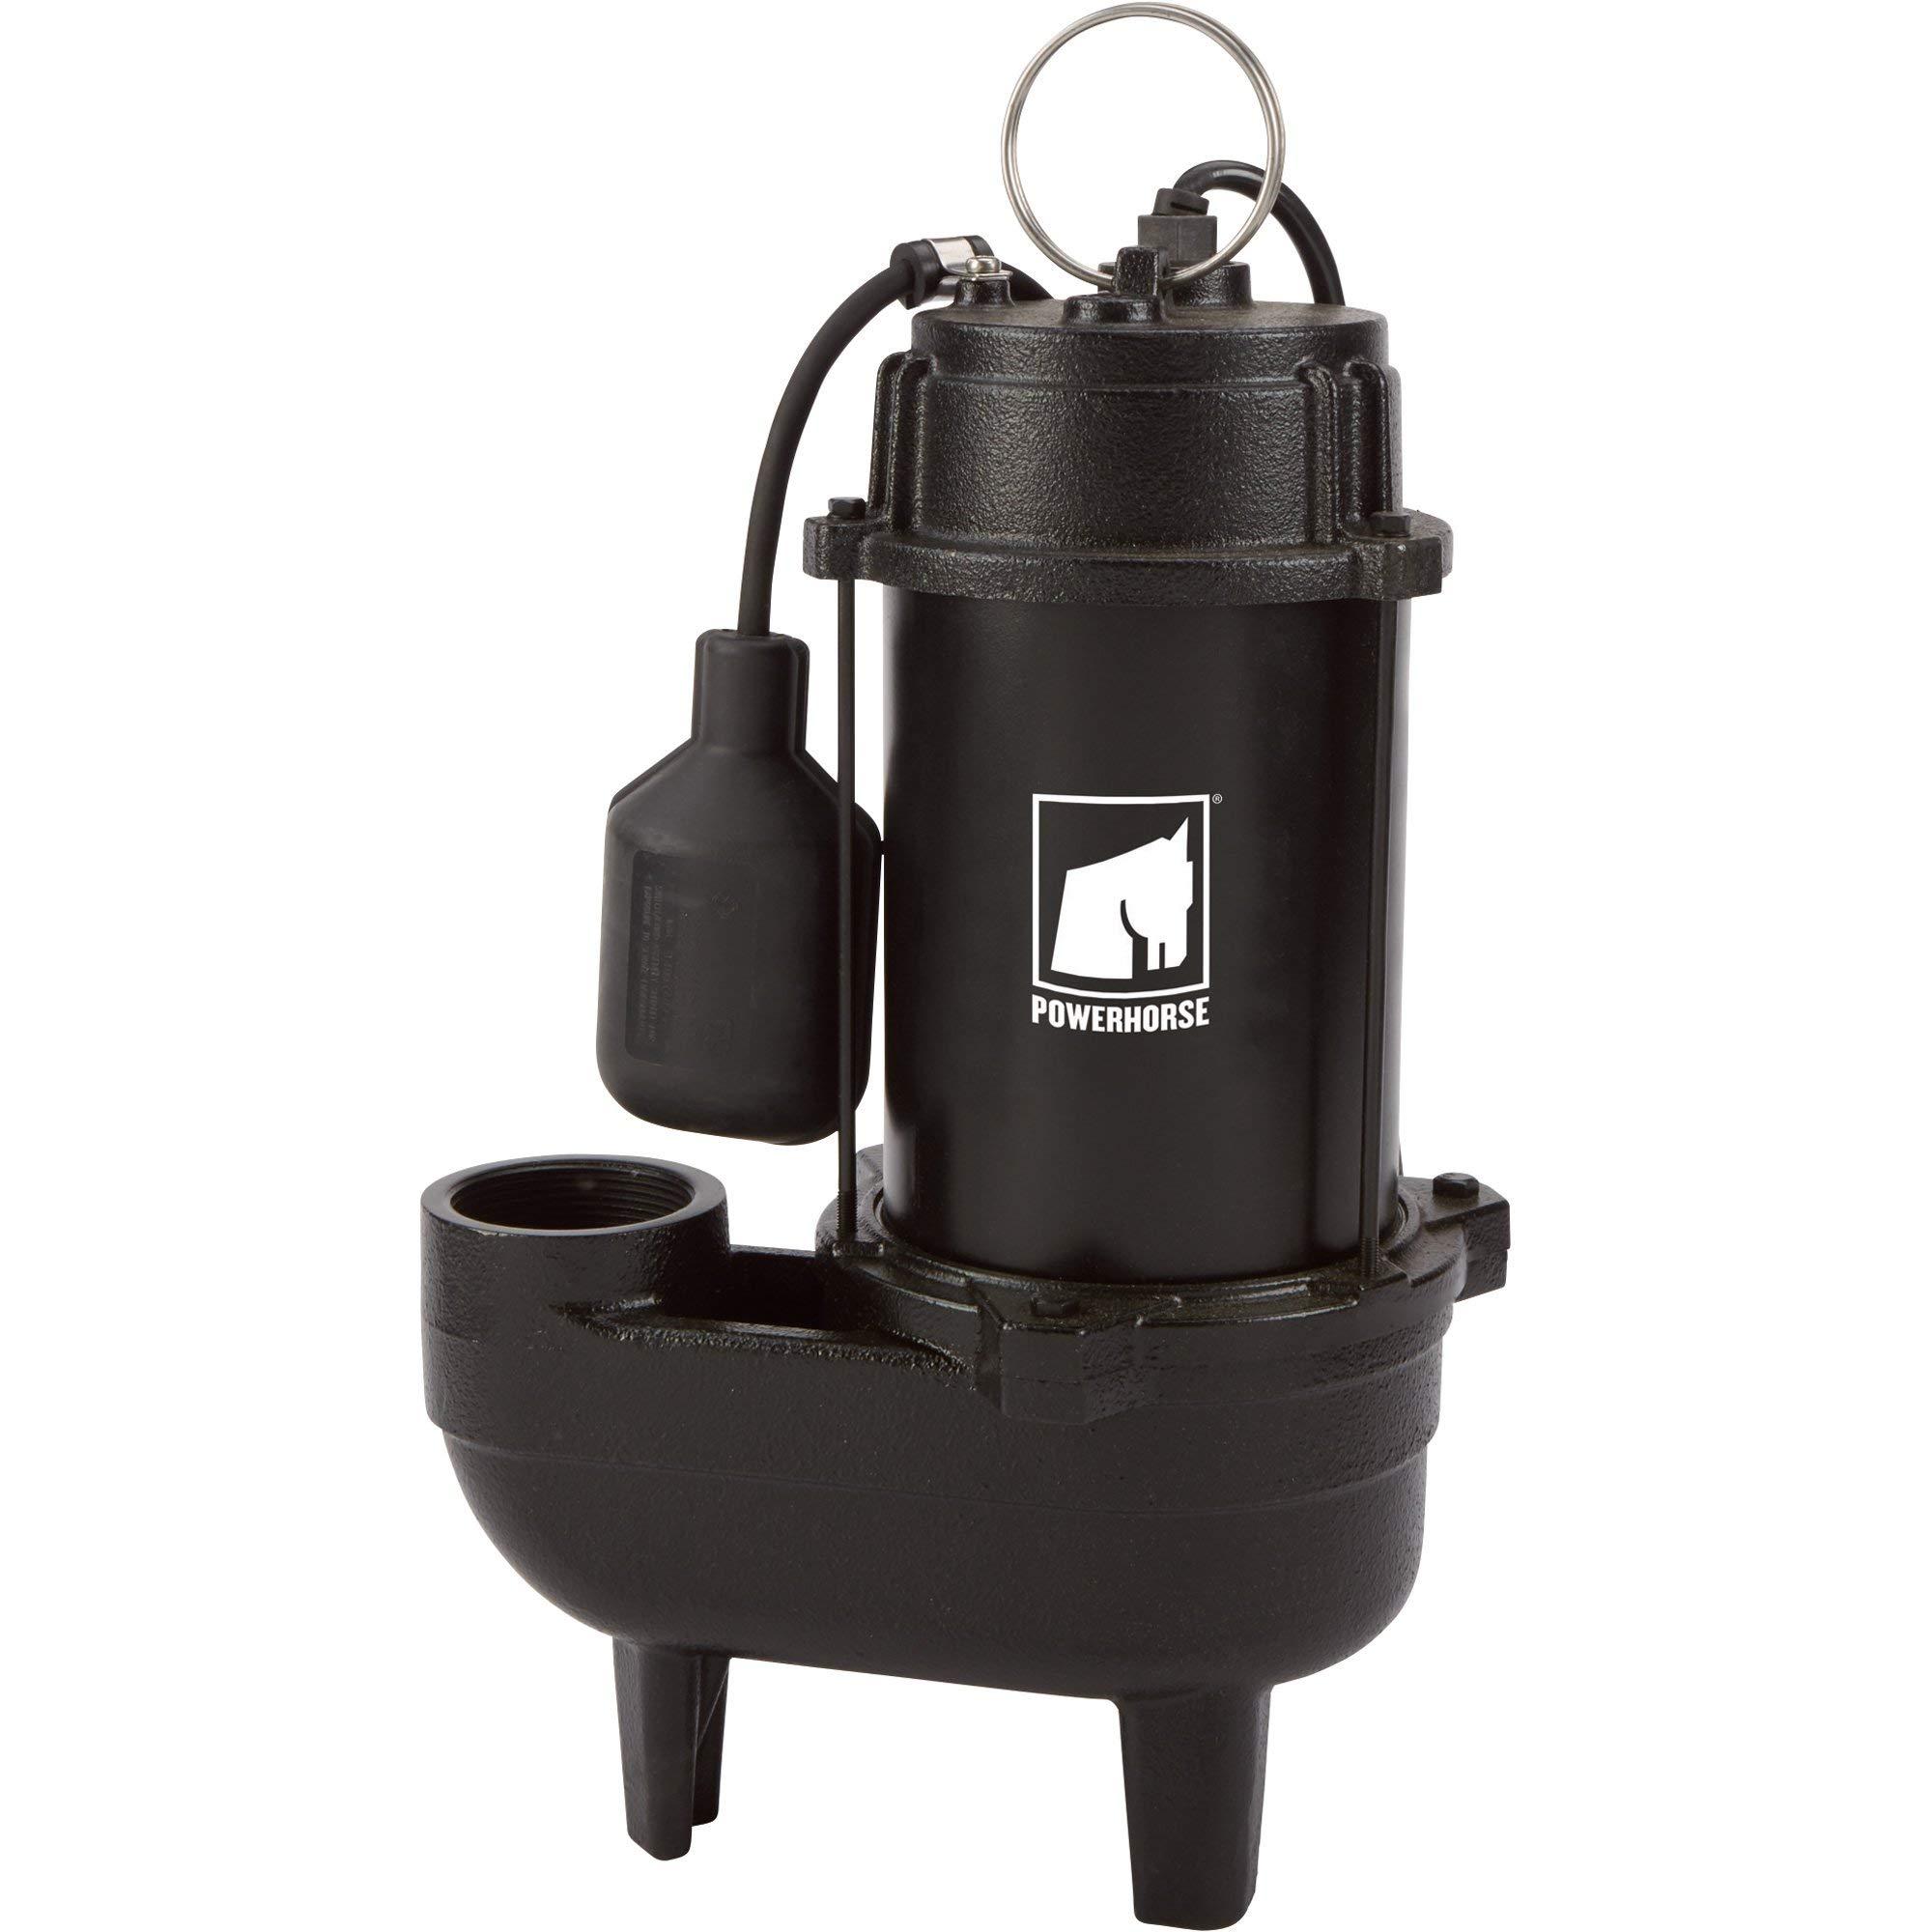 Powerhorse Cast Iron Sewage Pump - 4,180 GPH, 1/2 HP, 2in. Ports by Powerhorse